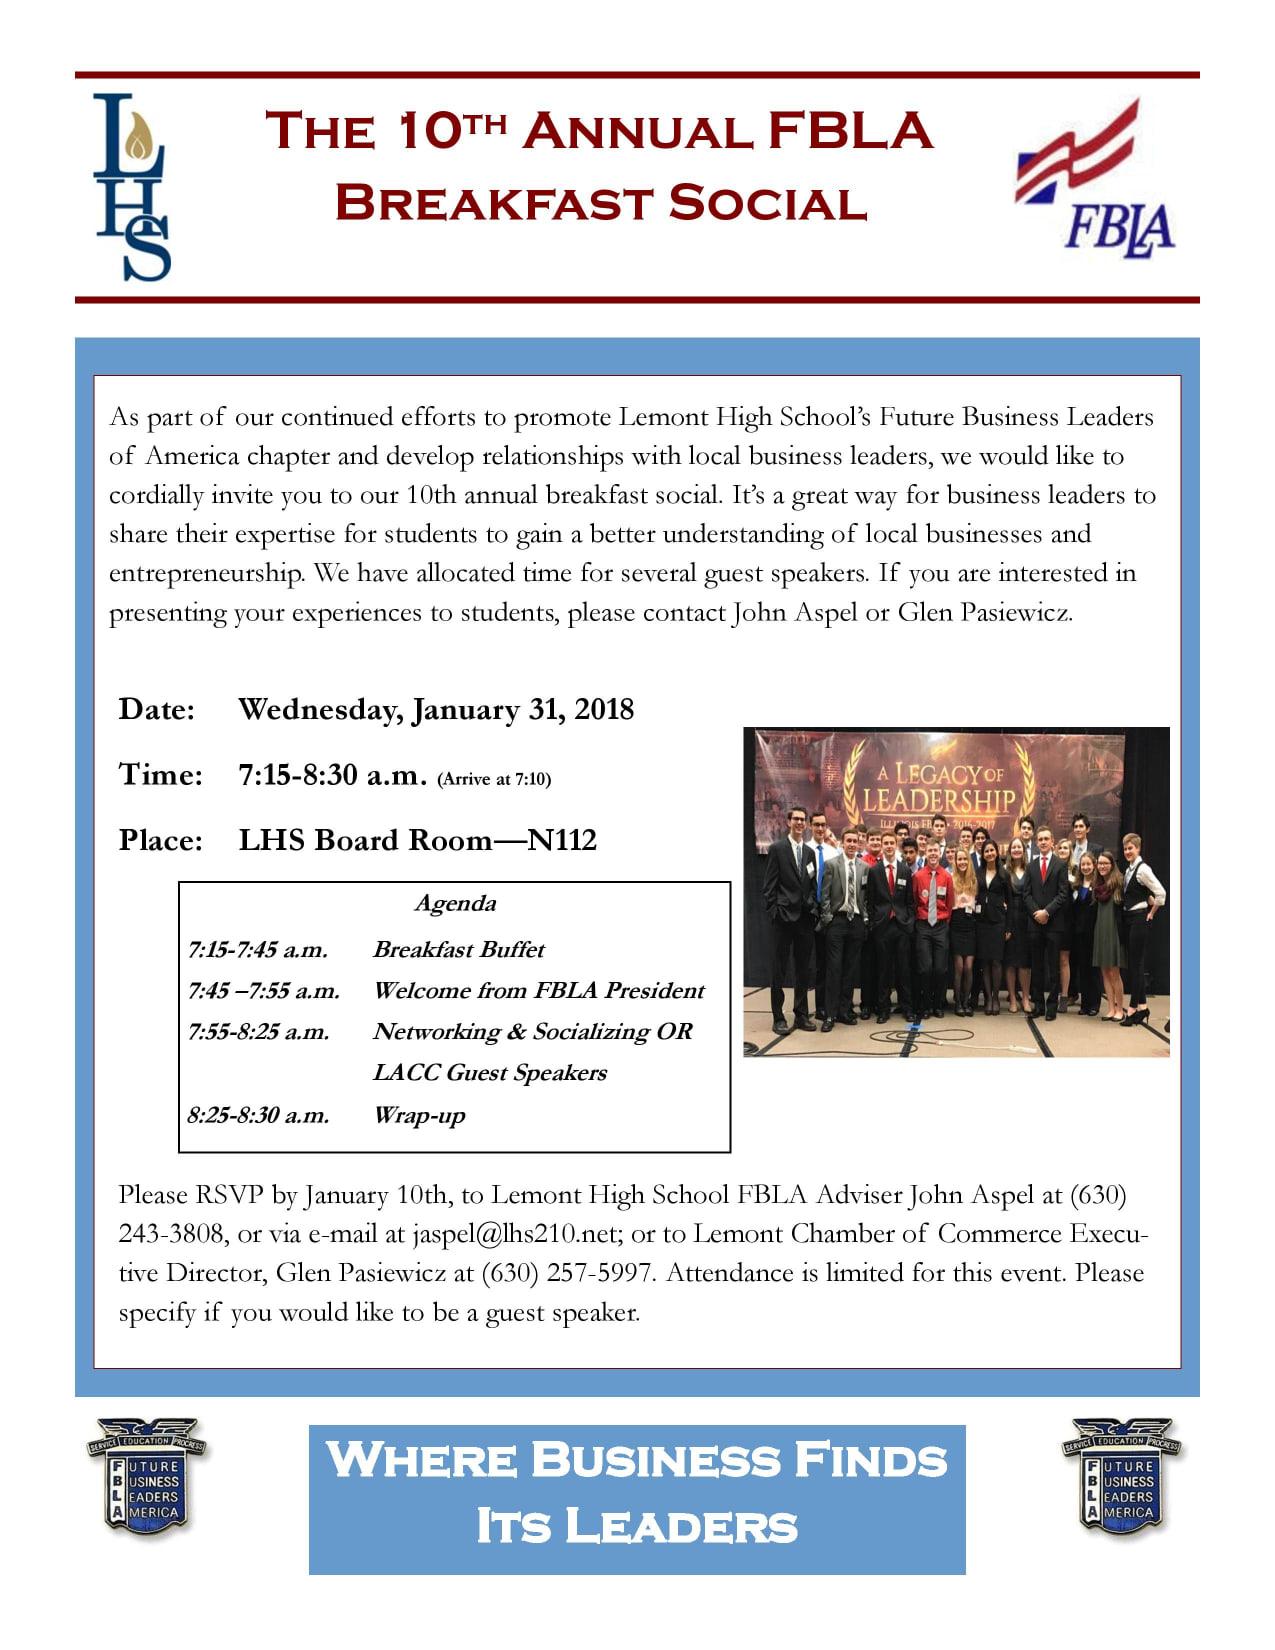 FBLA-CofC-Breakfast-Invite_Final-Revised-Fall-2017-page-001-w1275.jpg